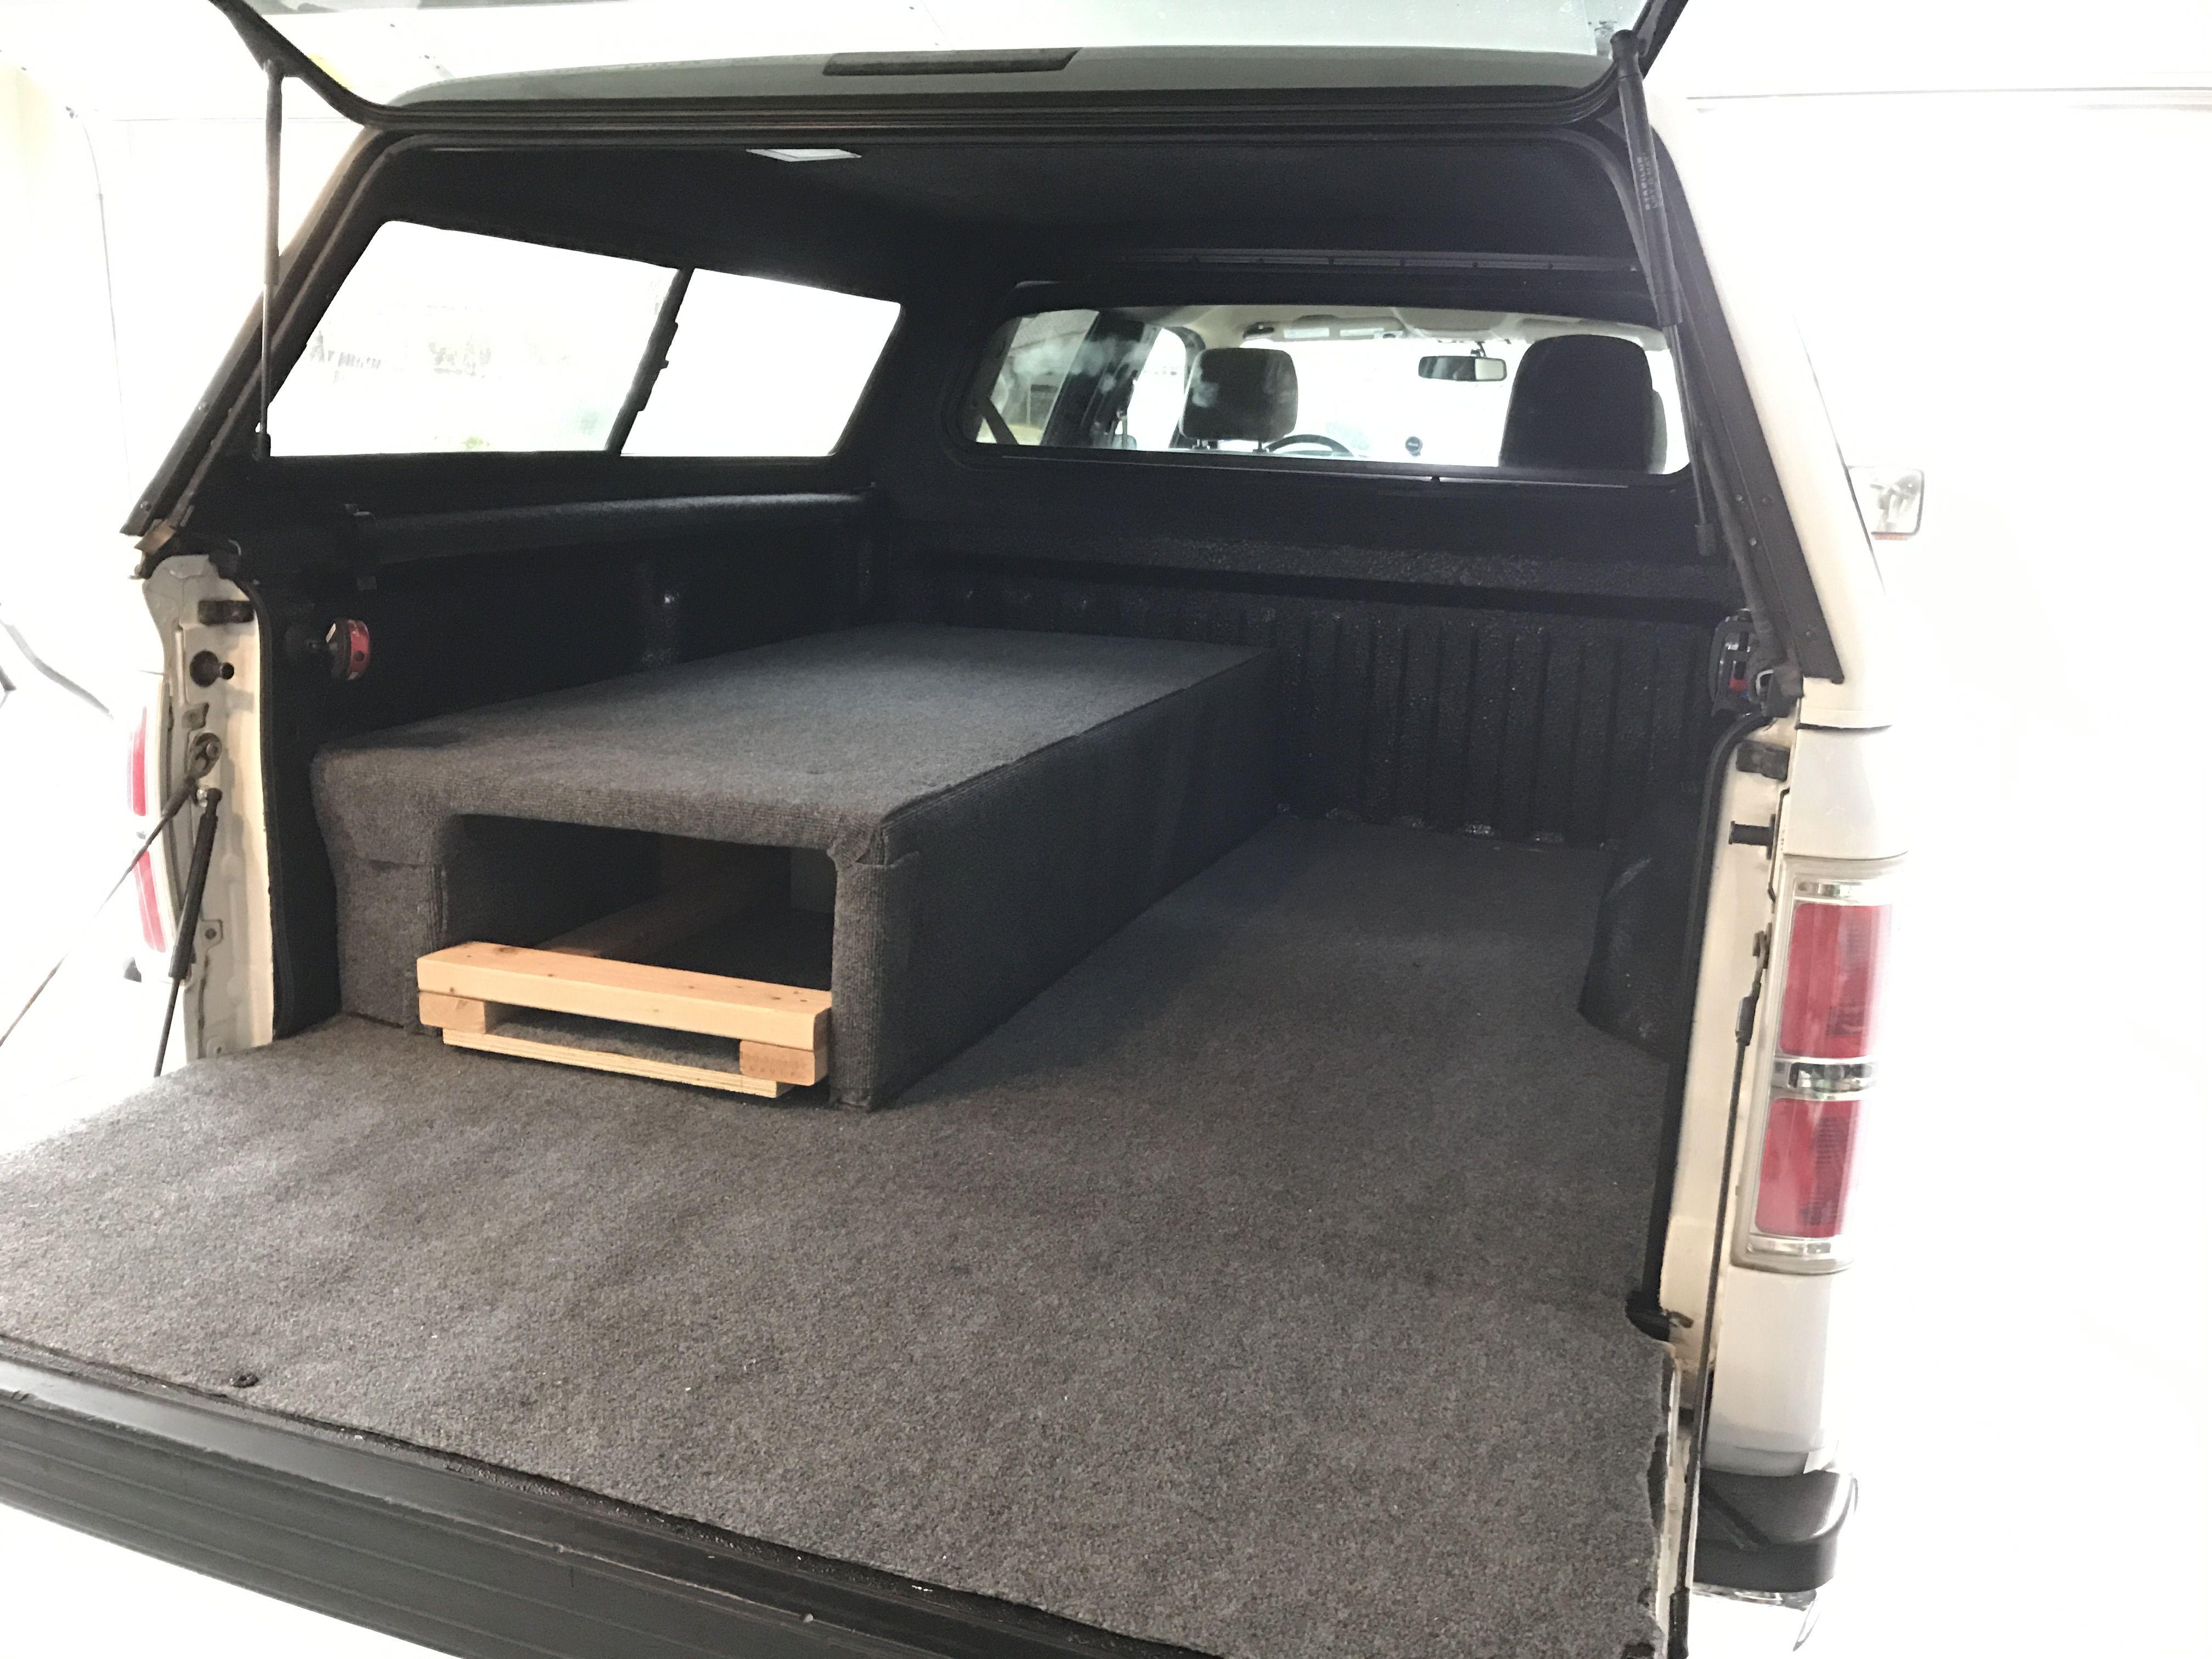 Pin by Jack Acosta on DIY hidden truck storage/camper bed